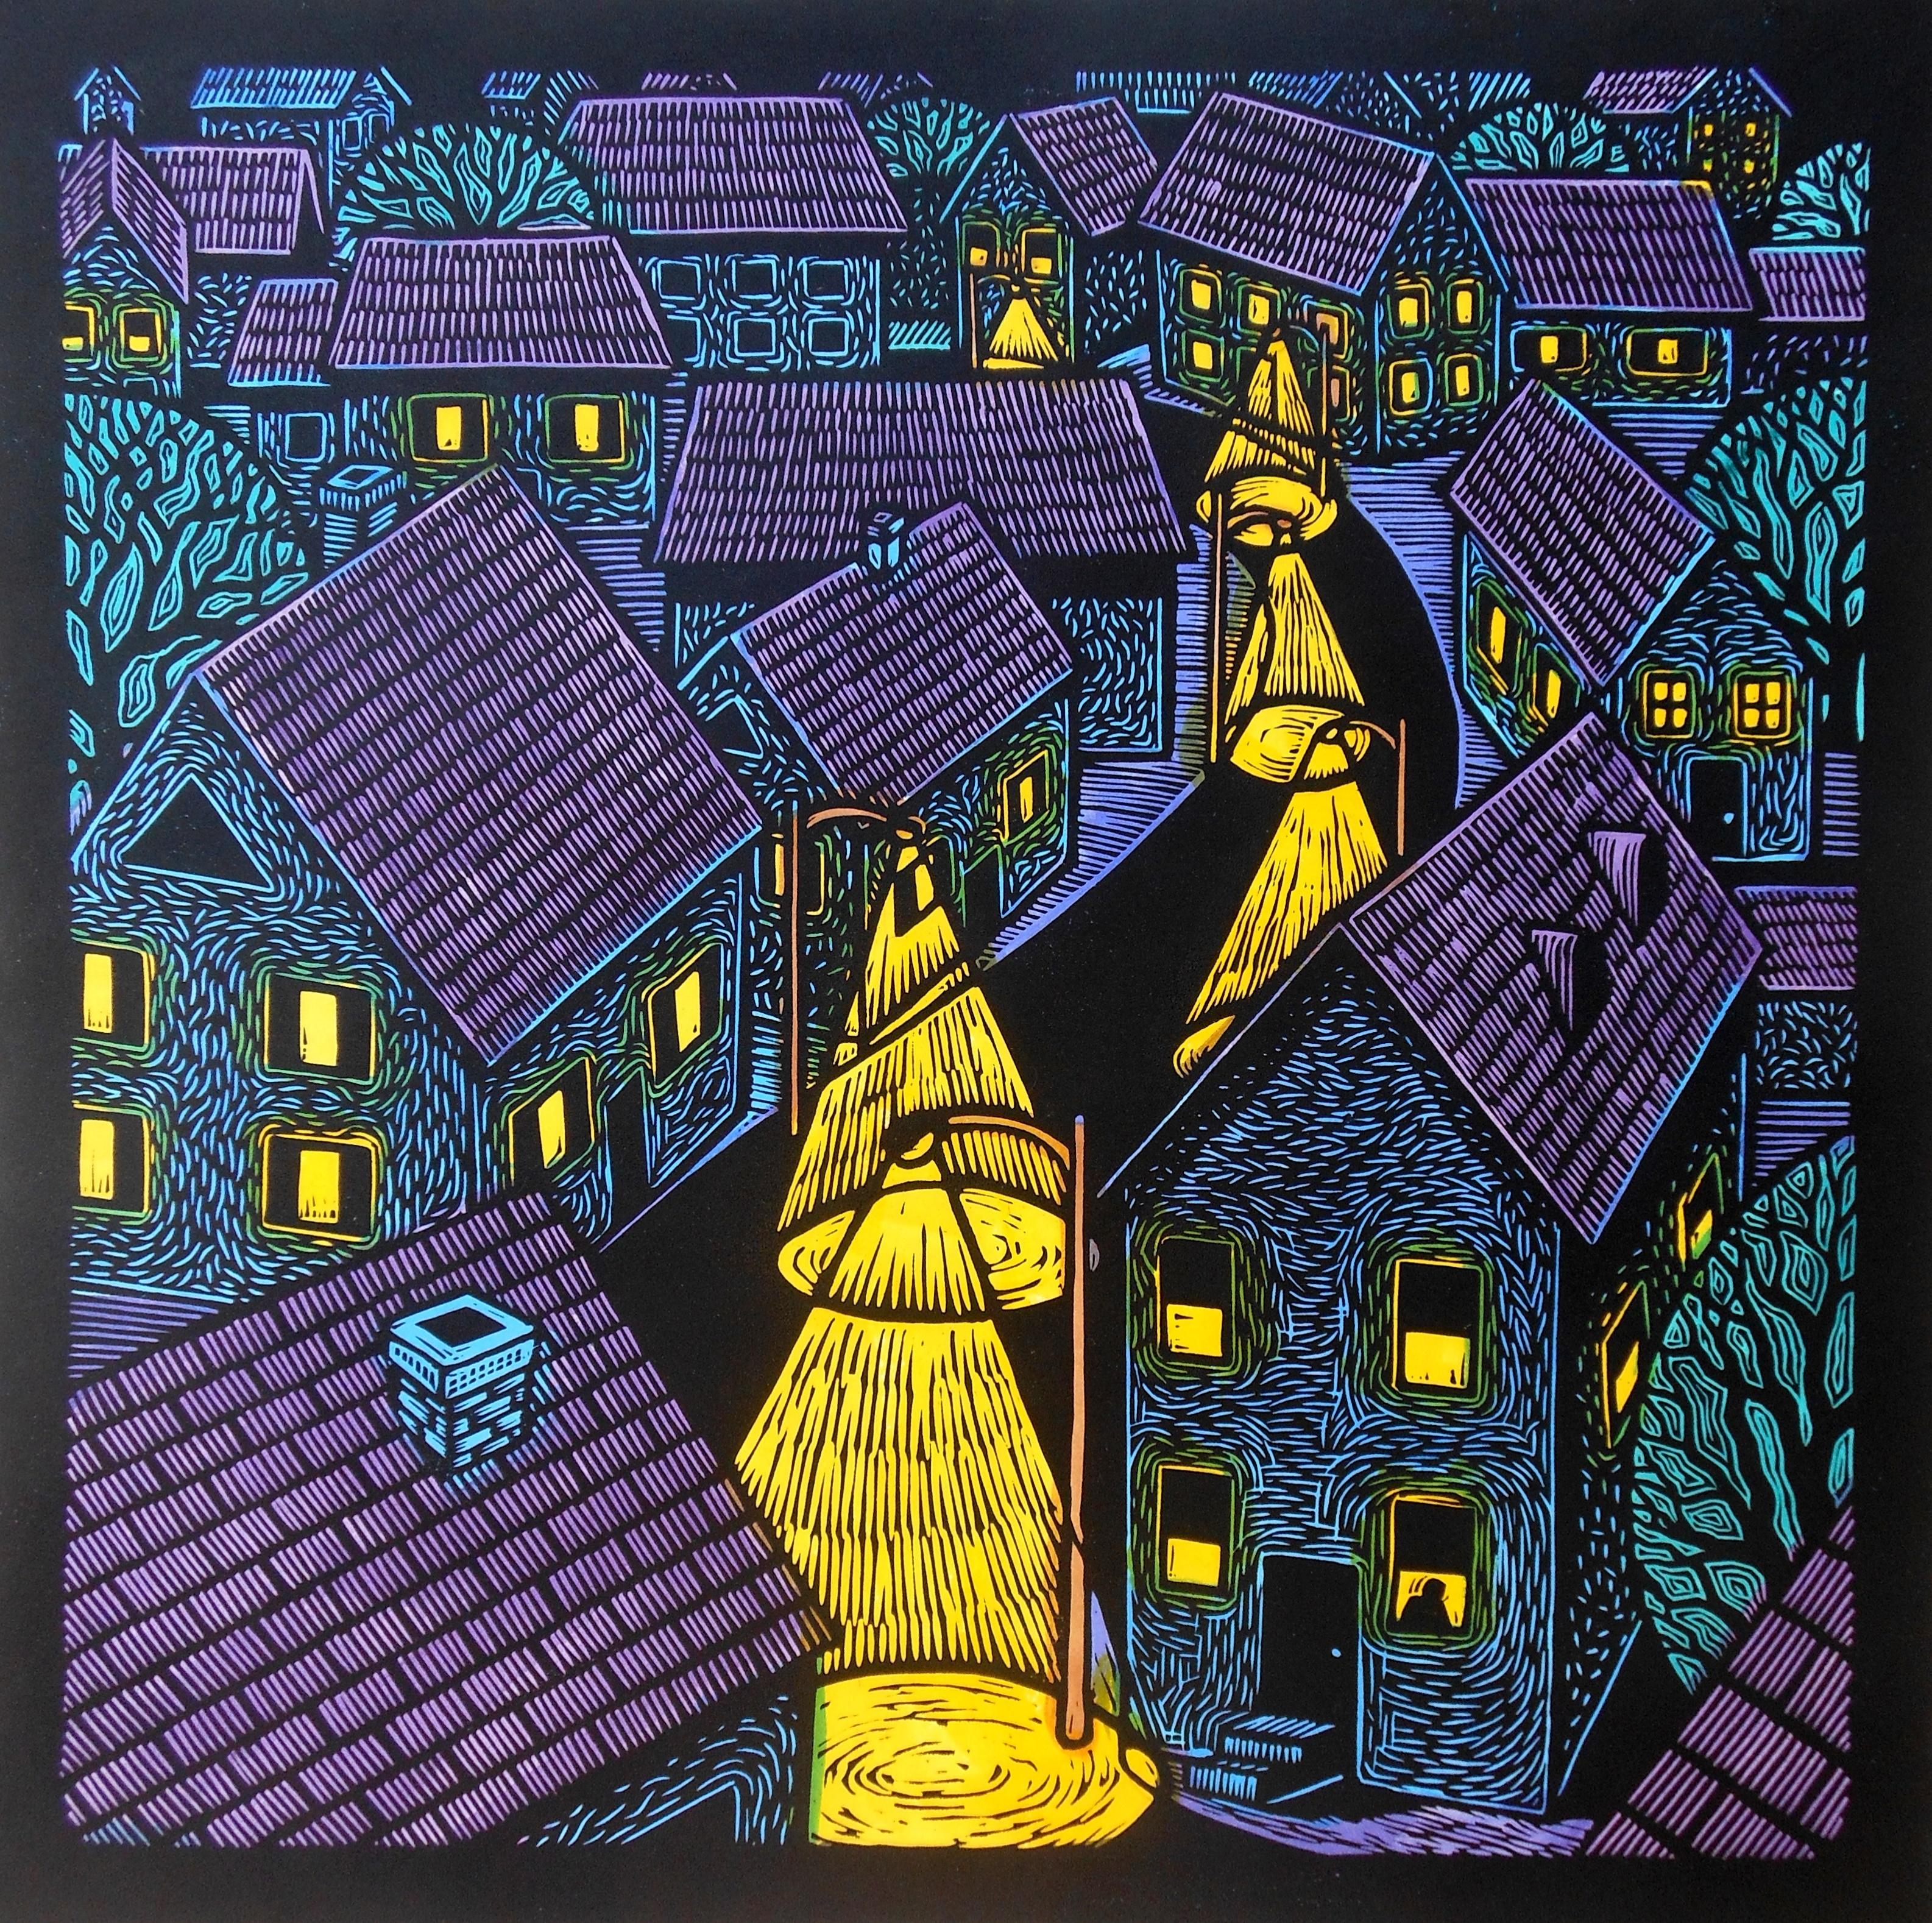 """The Black Road"" - 18"" x 18"" -  Linoleum block print with water color on handmade Kozo paper"